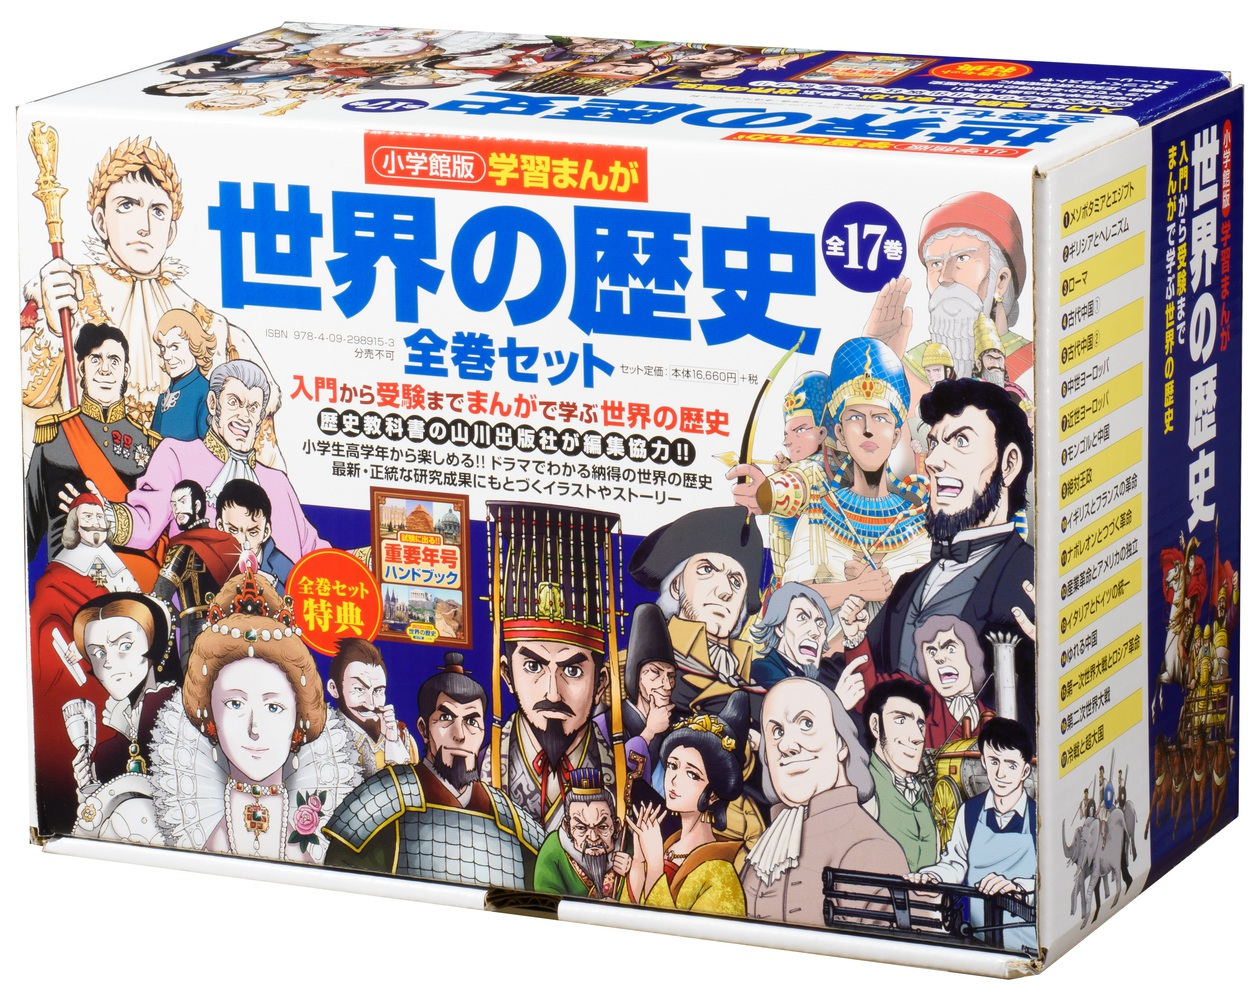 https://www.shogakukan.co.jp/thumbnail/snsbooks/09298915